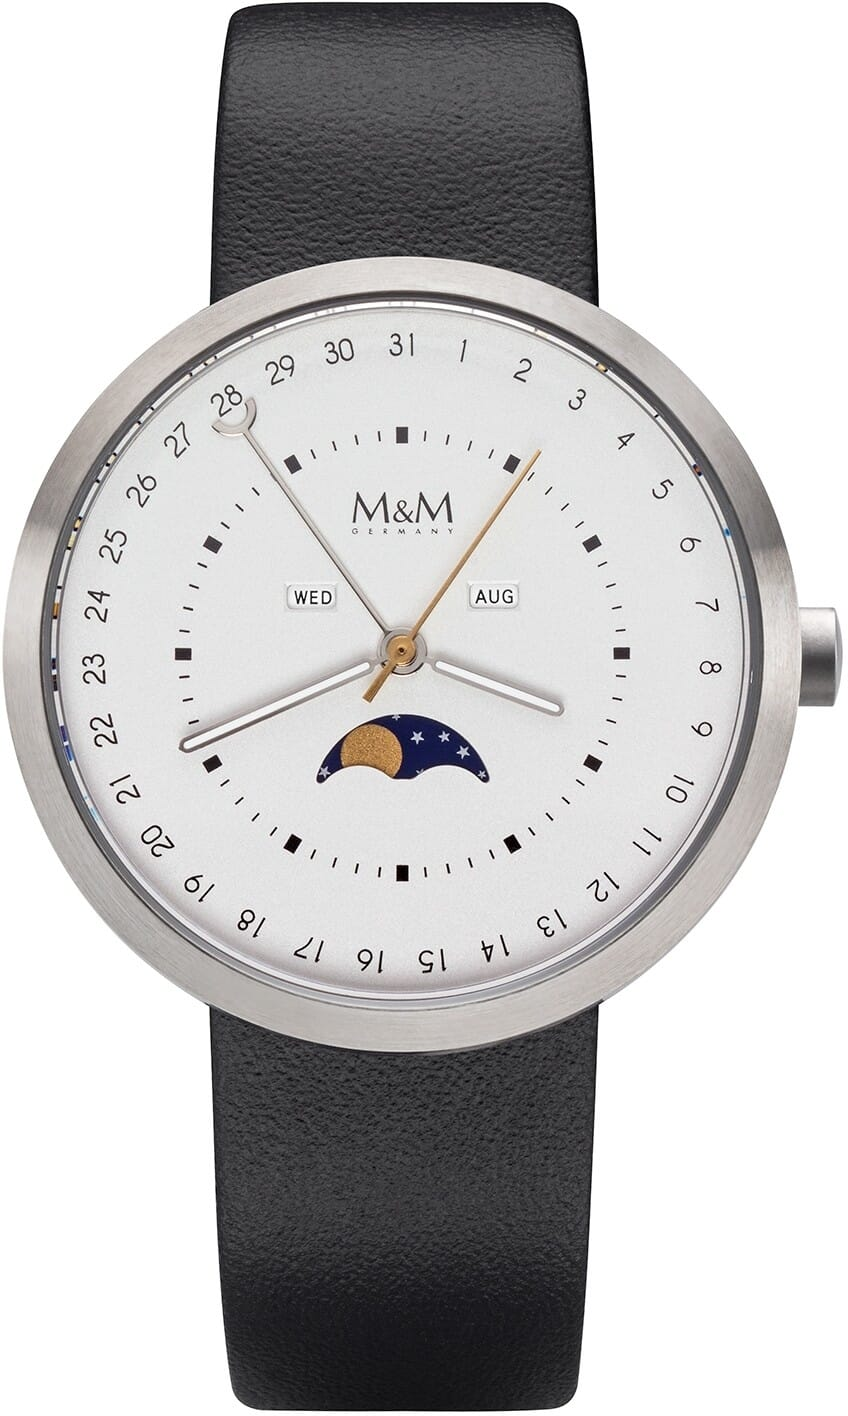 MM Germany M11949-423